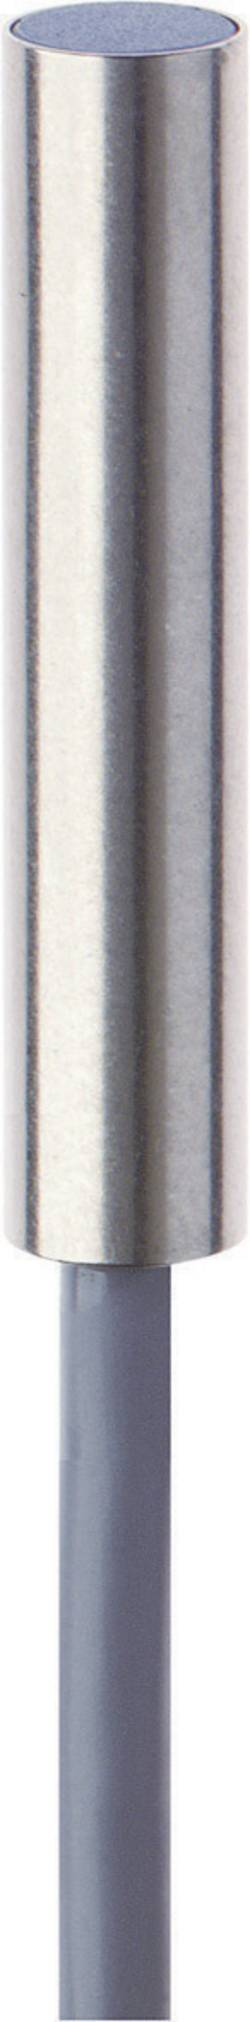 Indukční senzor PNP Contrinex DW-AD-603-065 (220 220 003), 1,5 mm, IP67